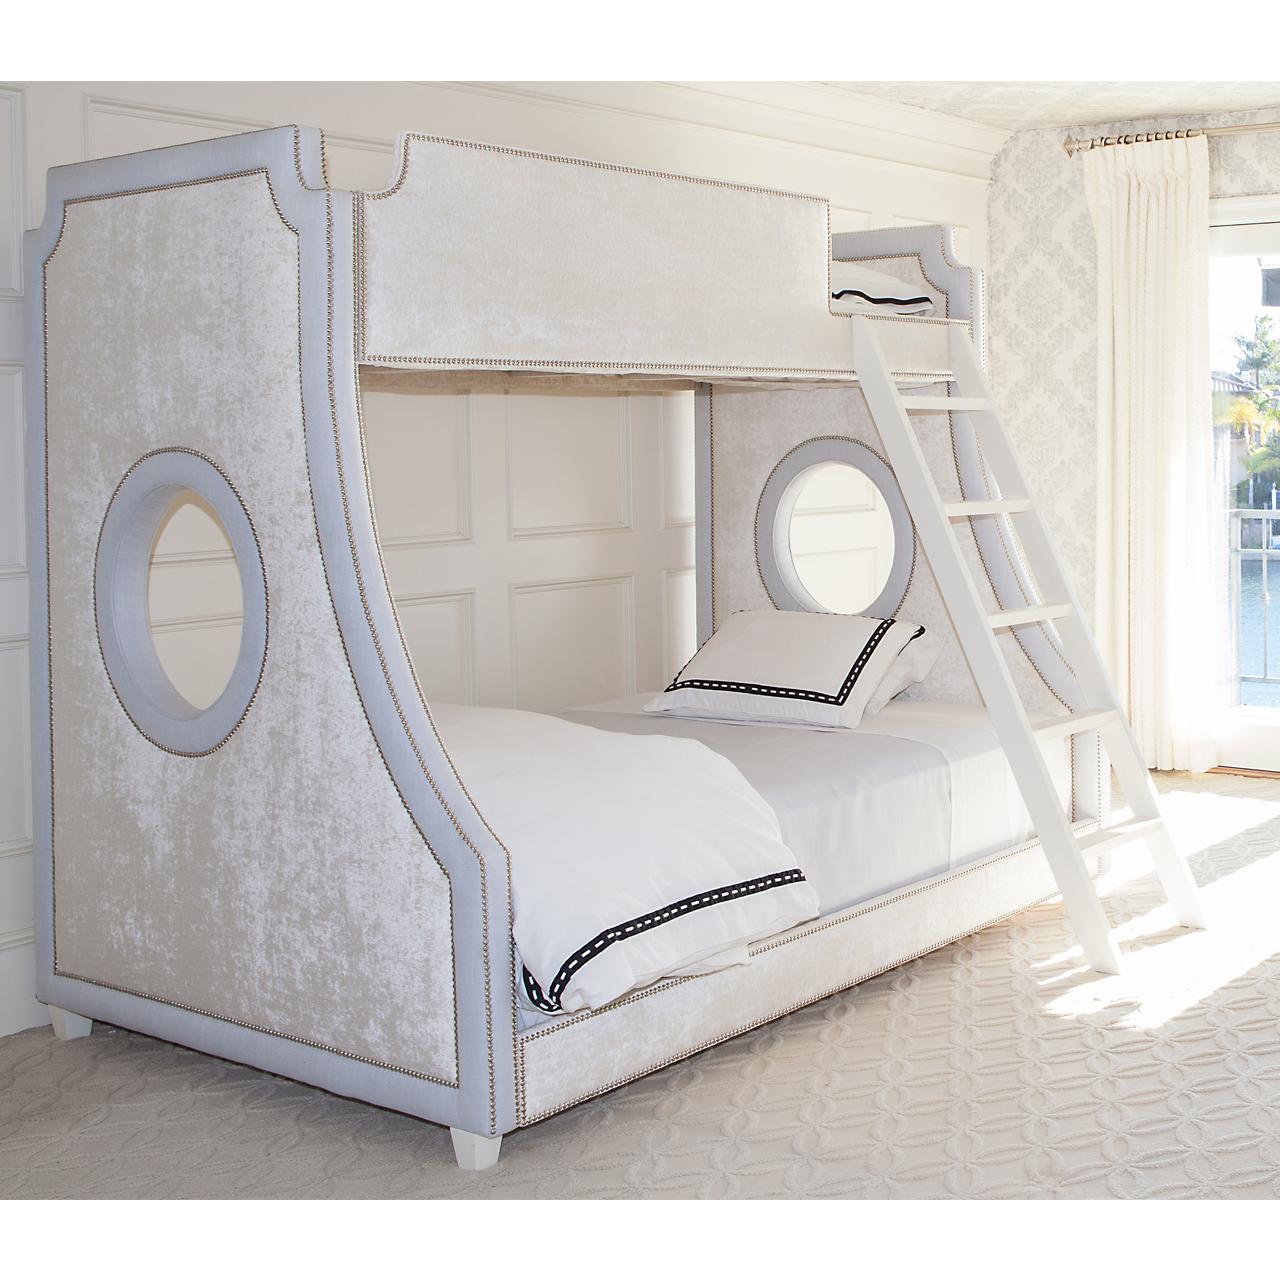 Bedroom Aesthetic Contemporary Bedroom Sets King Ceiling Design For Bedroom Bedroom Interior In Kerala: Low Budget Interior Design